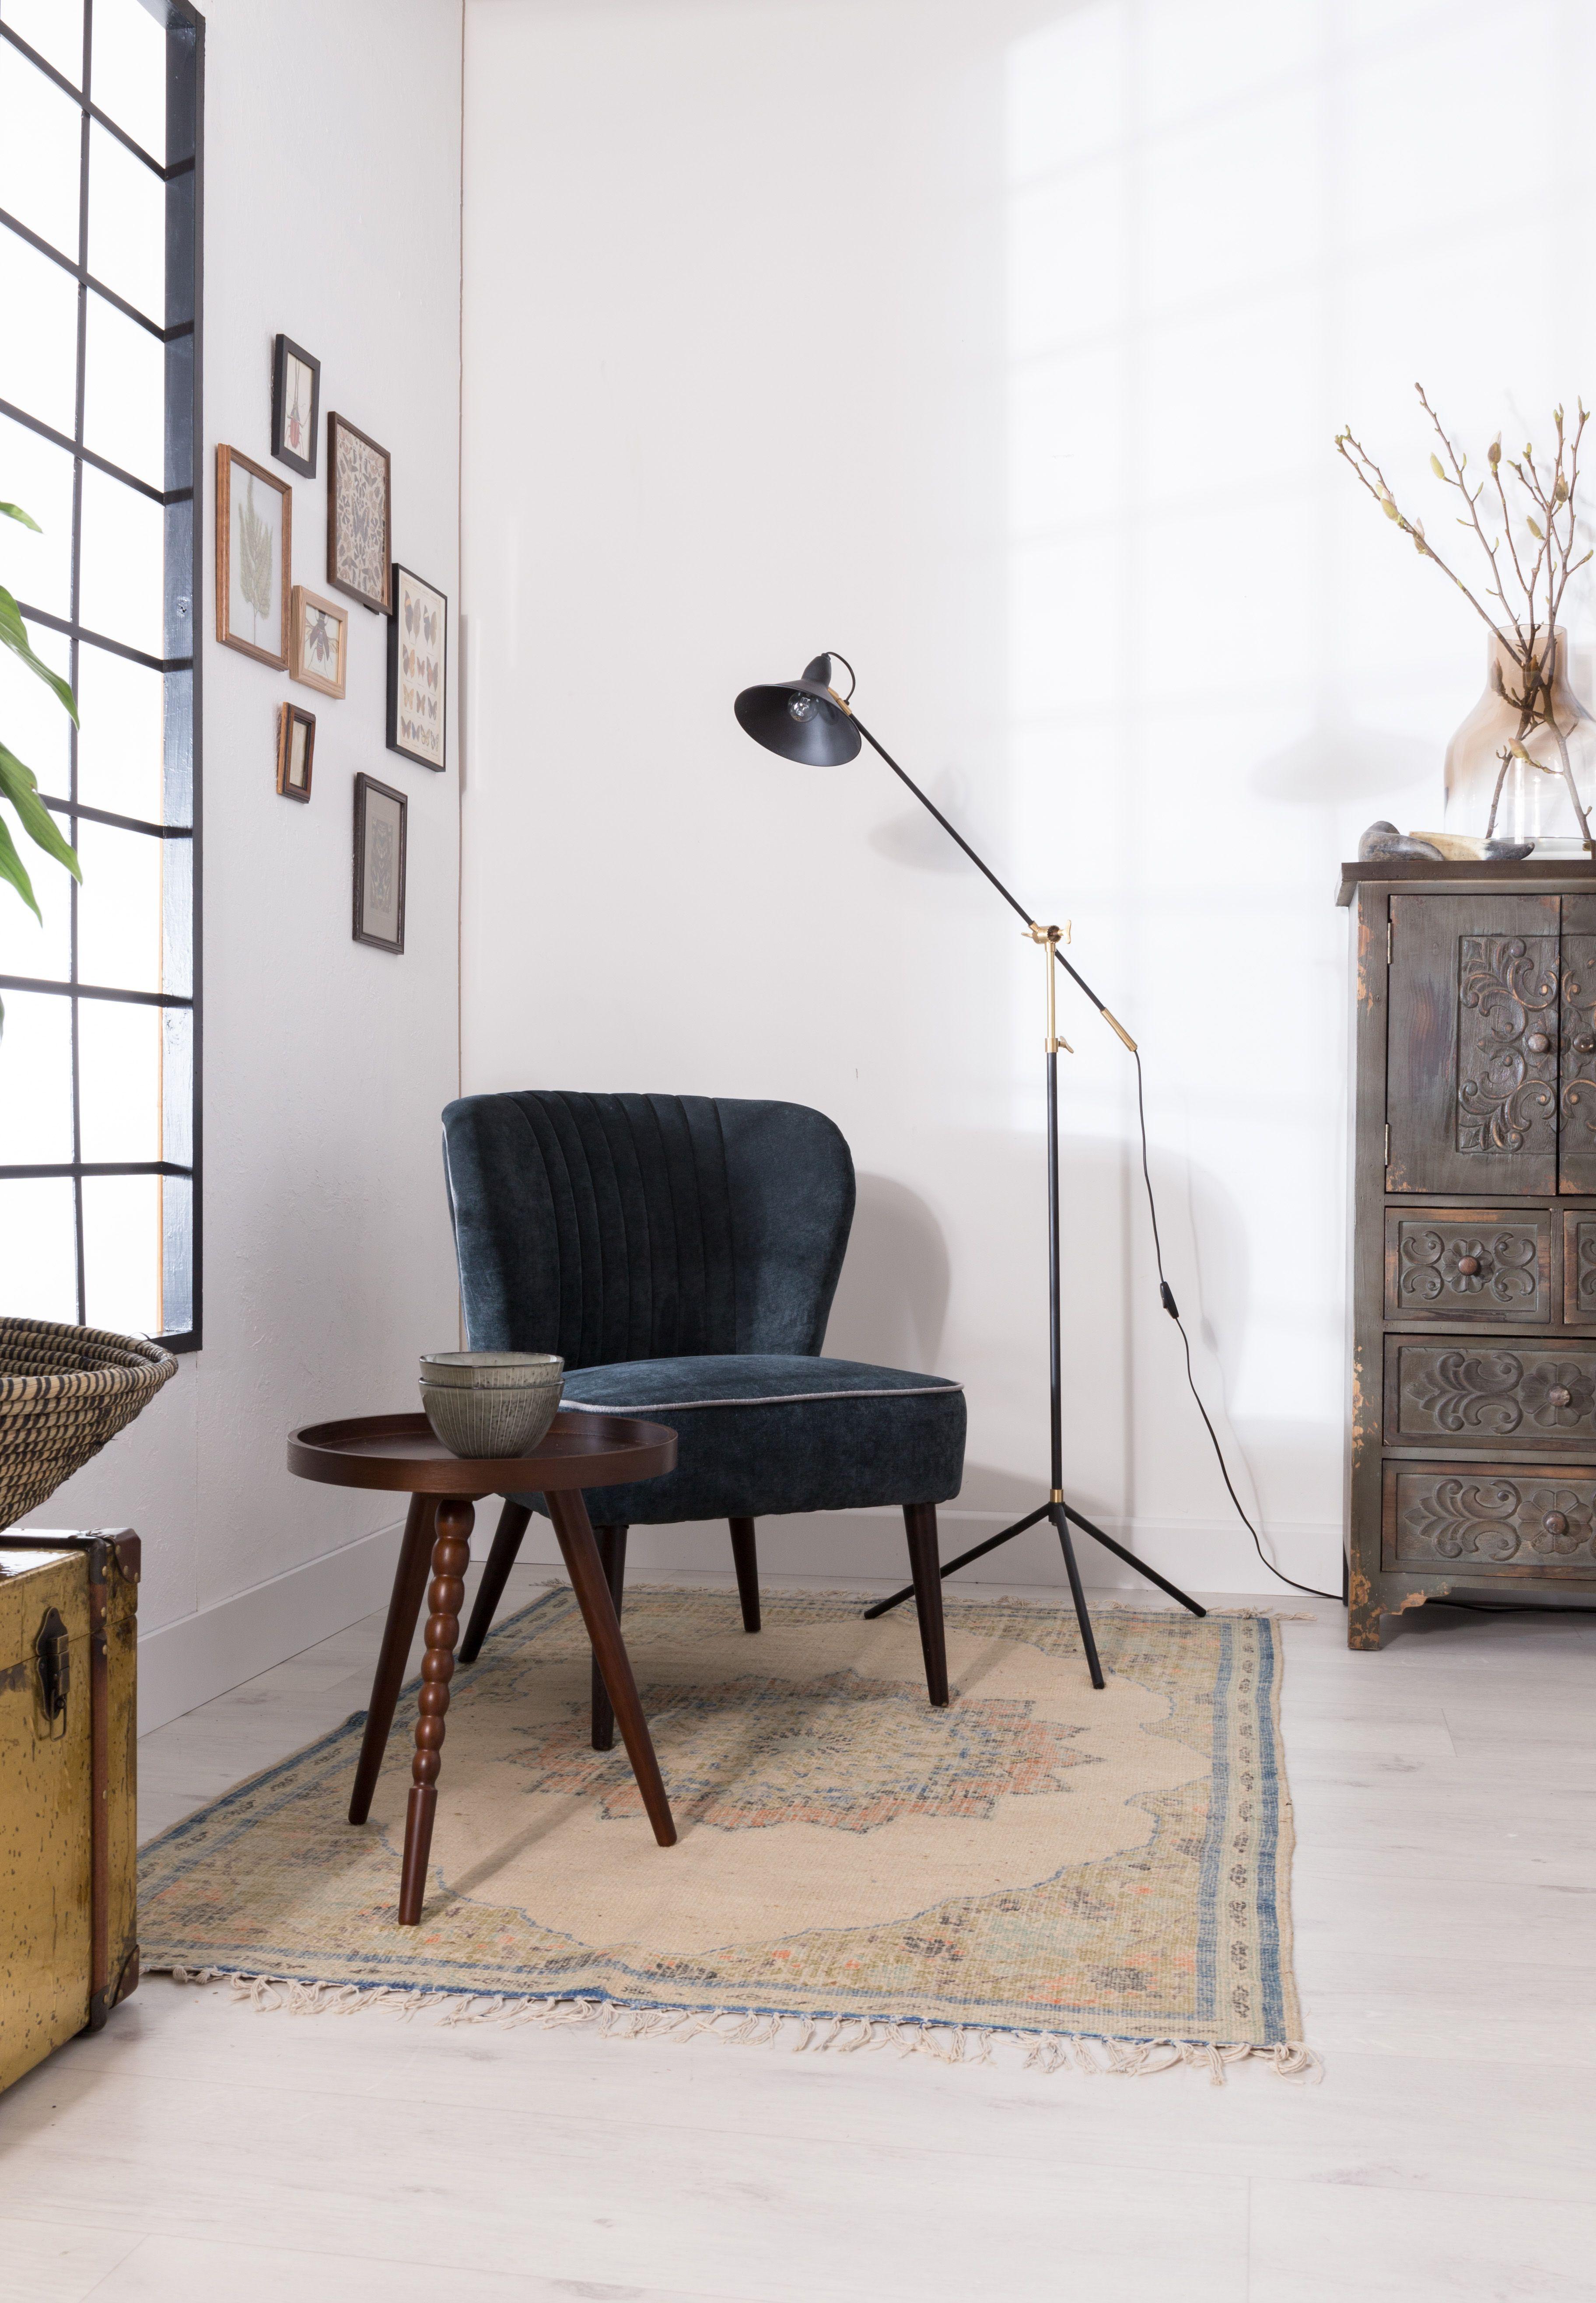 Swell Smoker Lounge Chair Decor Small Office Chair Lounge Inzonedesignstudio Interior Chair Design Inzonedesignstudiocom